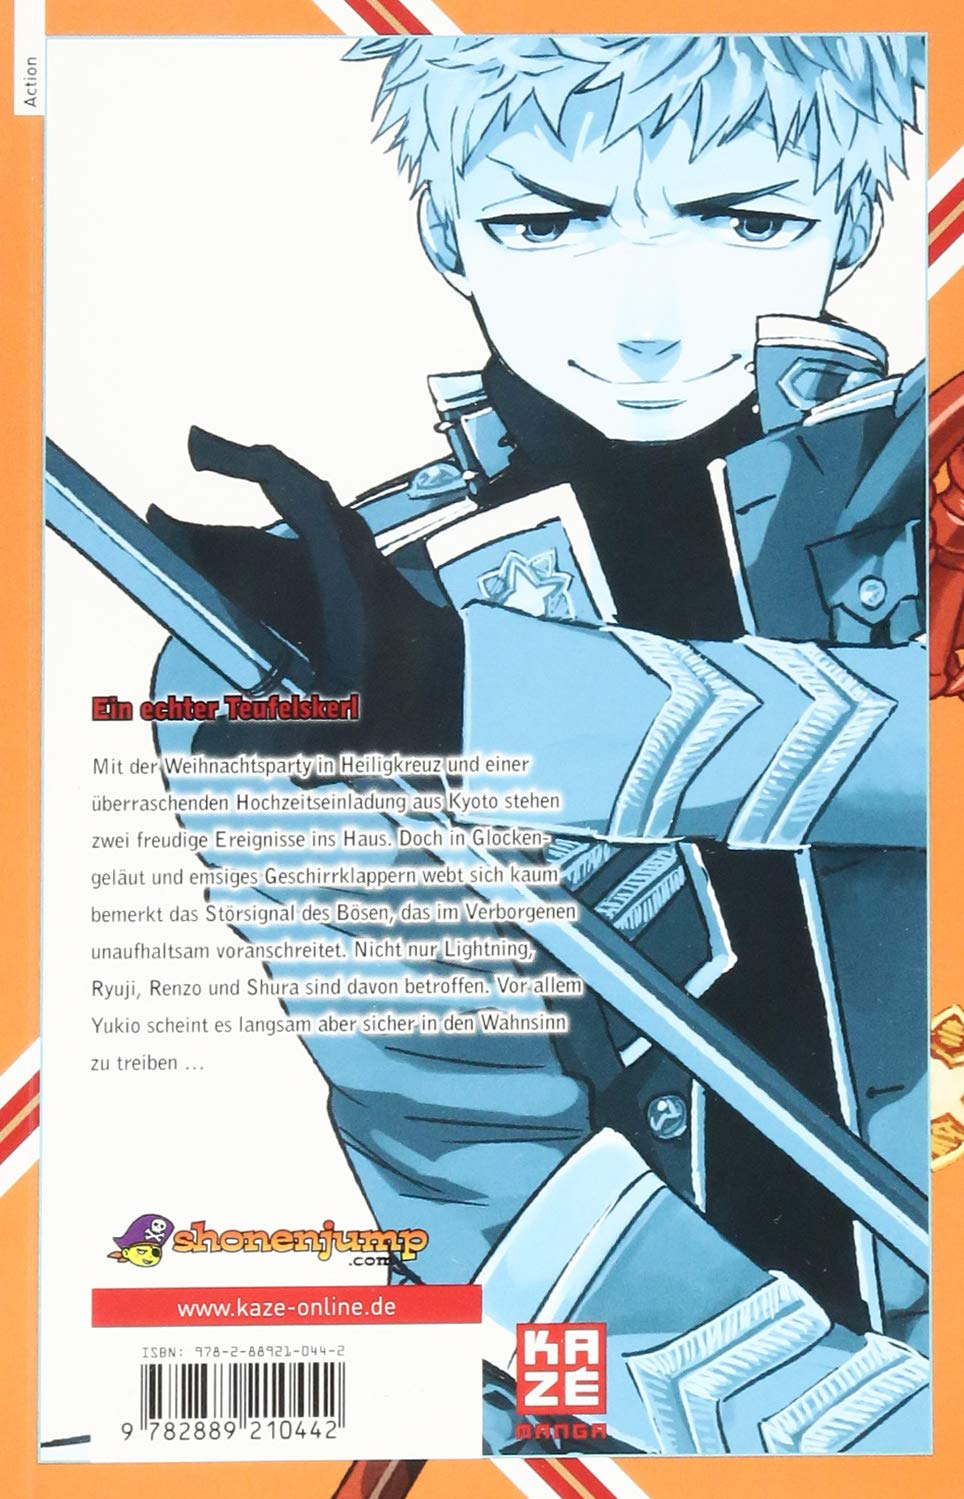 Blue exorcist 20 kazue kato 9782889210442 amazon com books